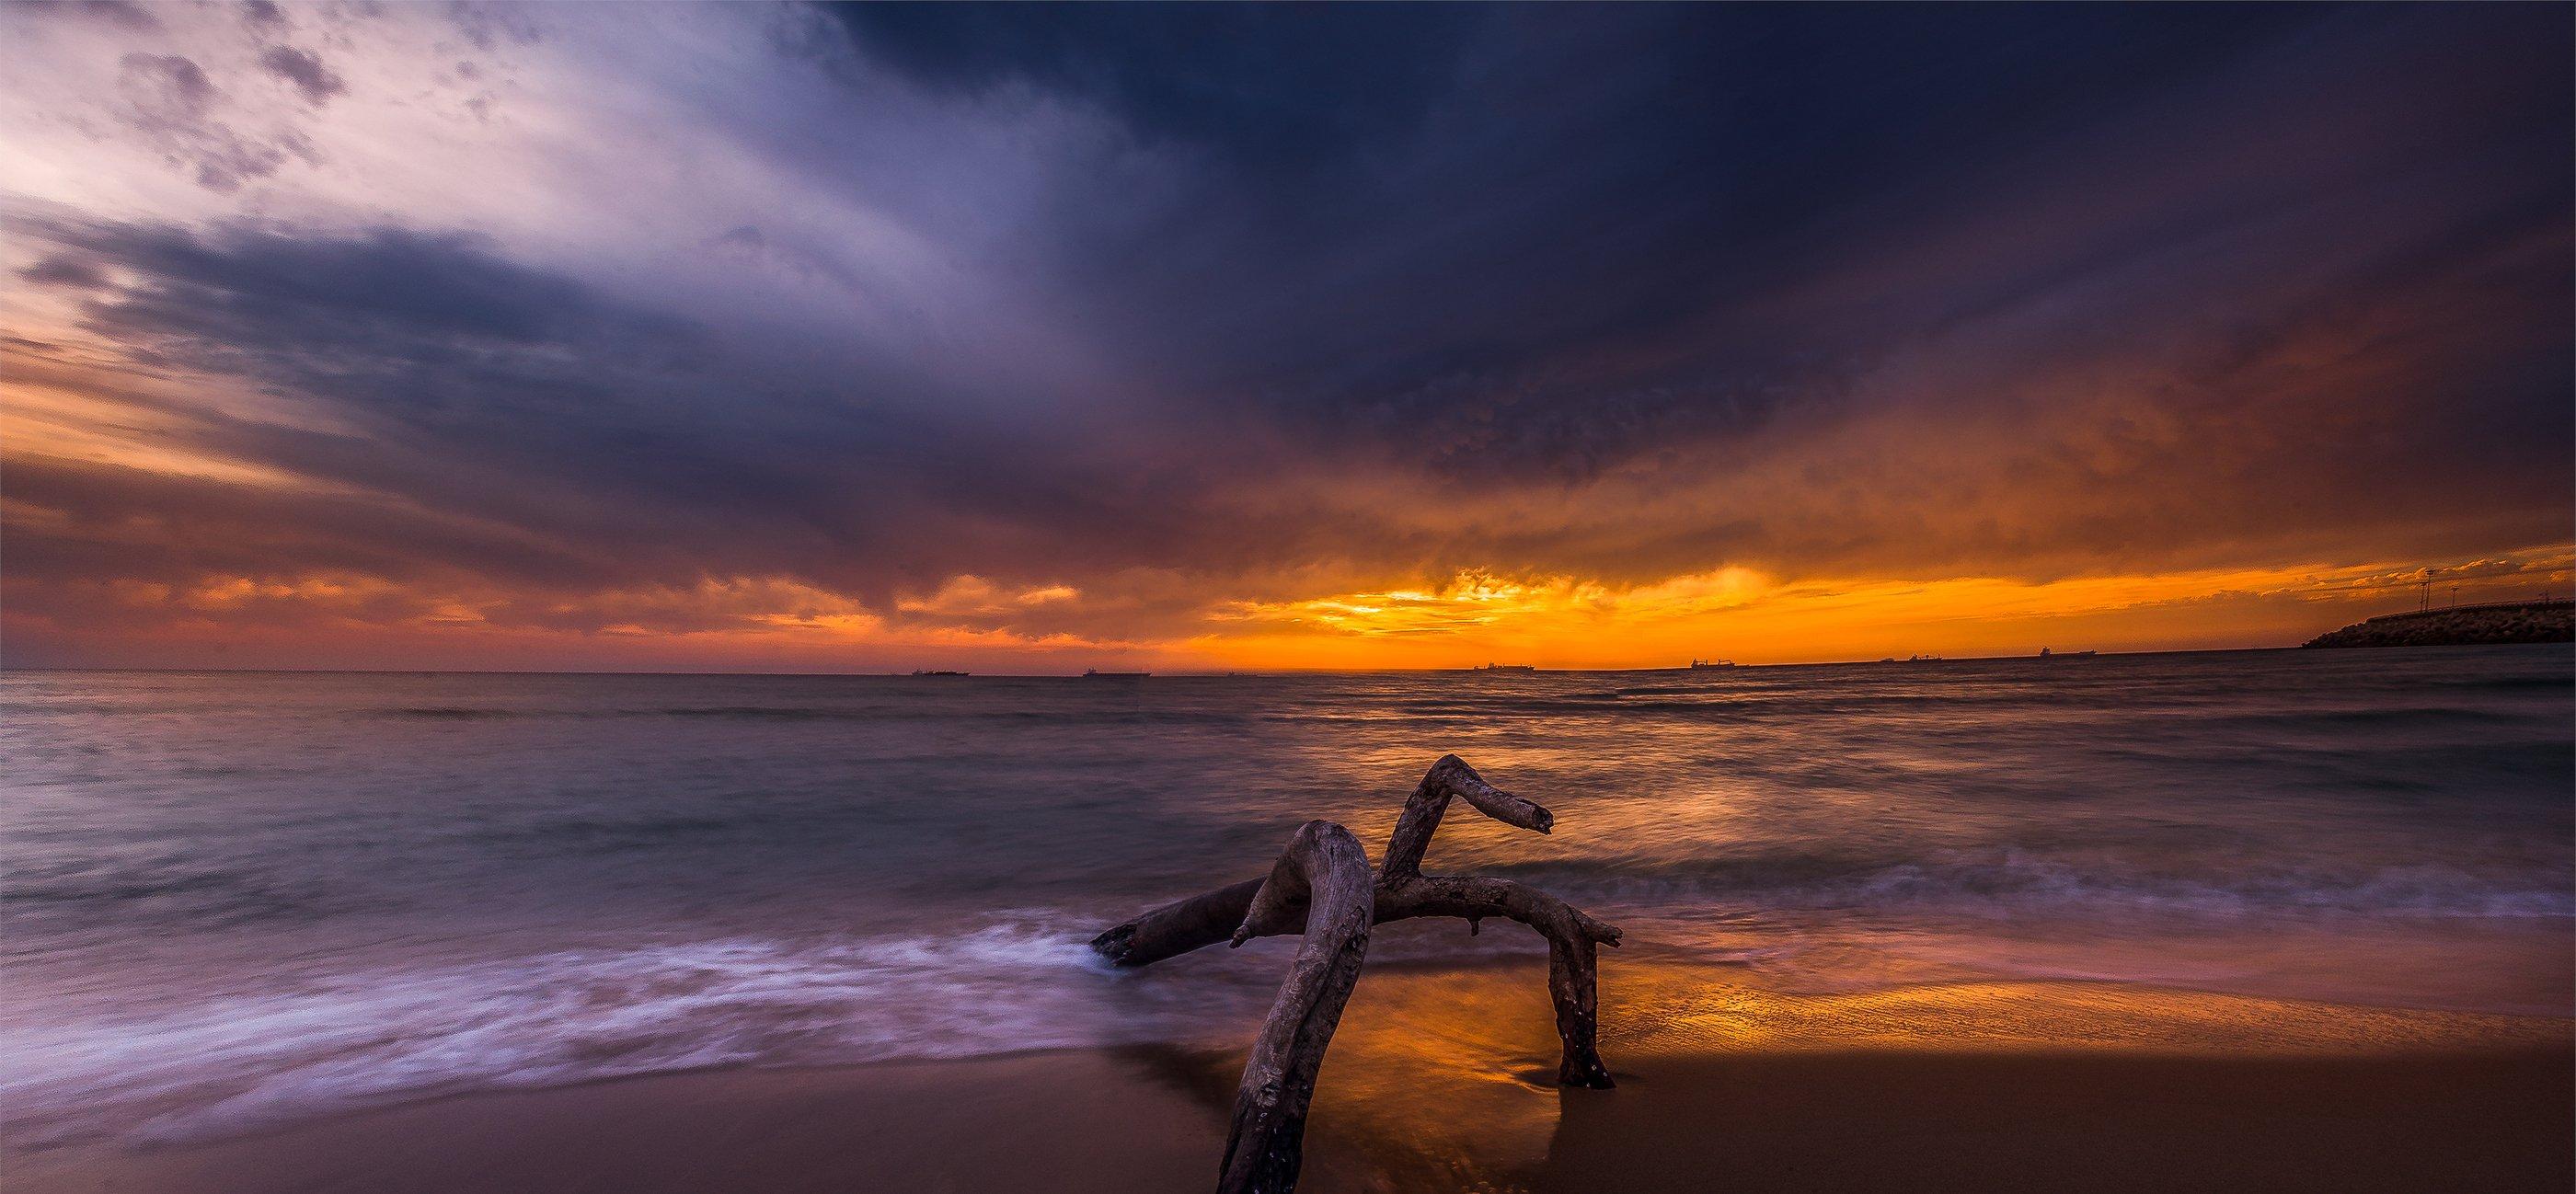 Blue, Clouds, Colorful, Sea, Waves, Миша Шнеер